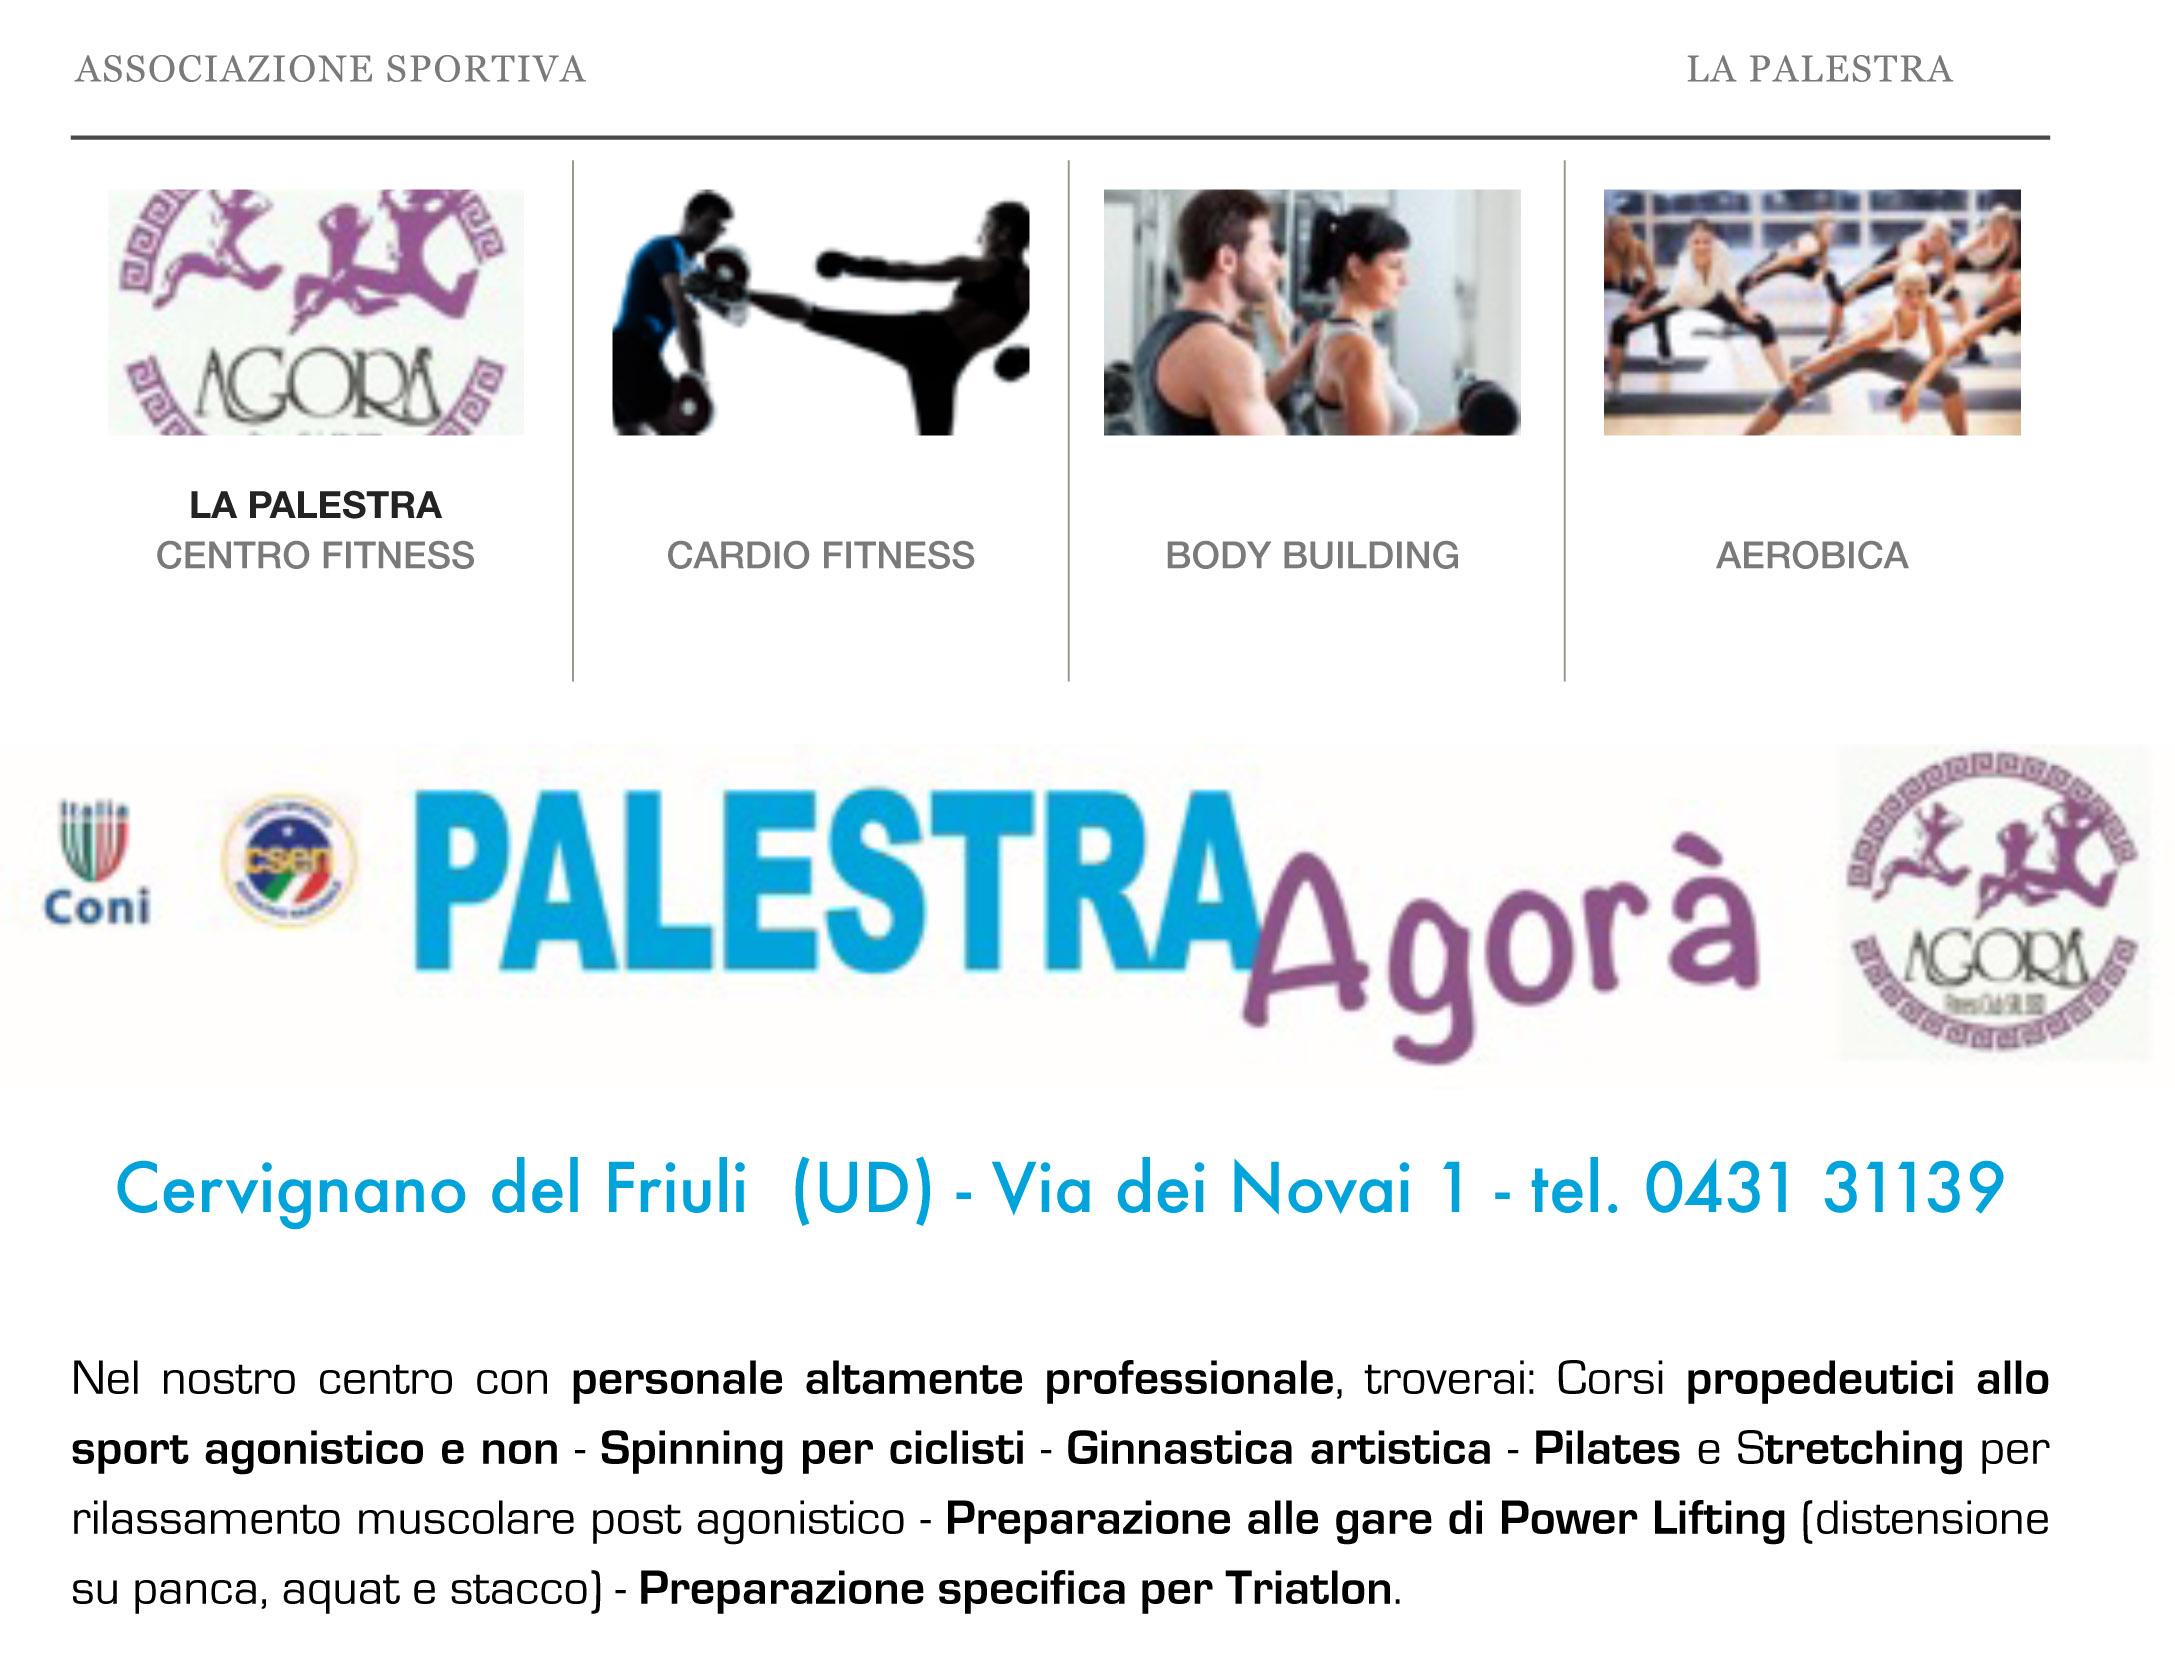 A.s.d. Palestra Agorà